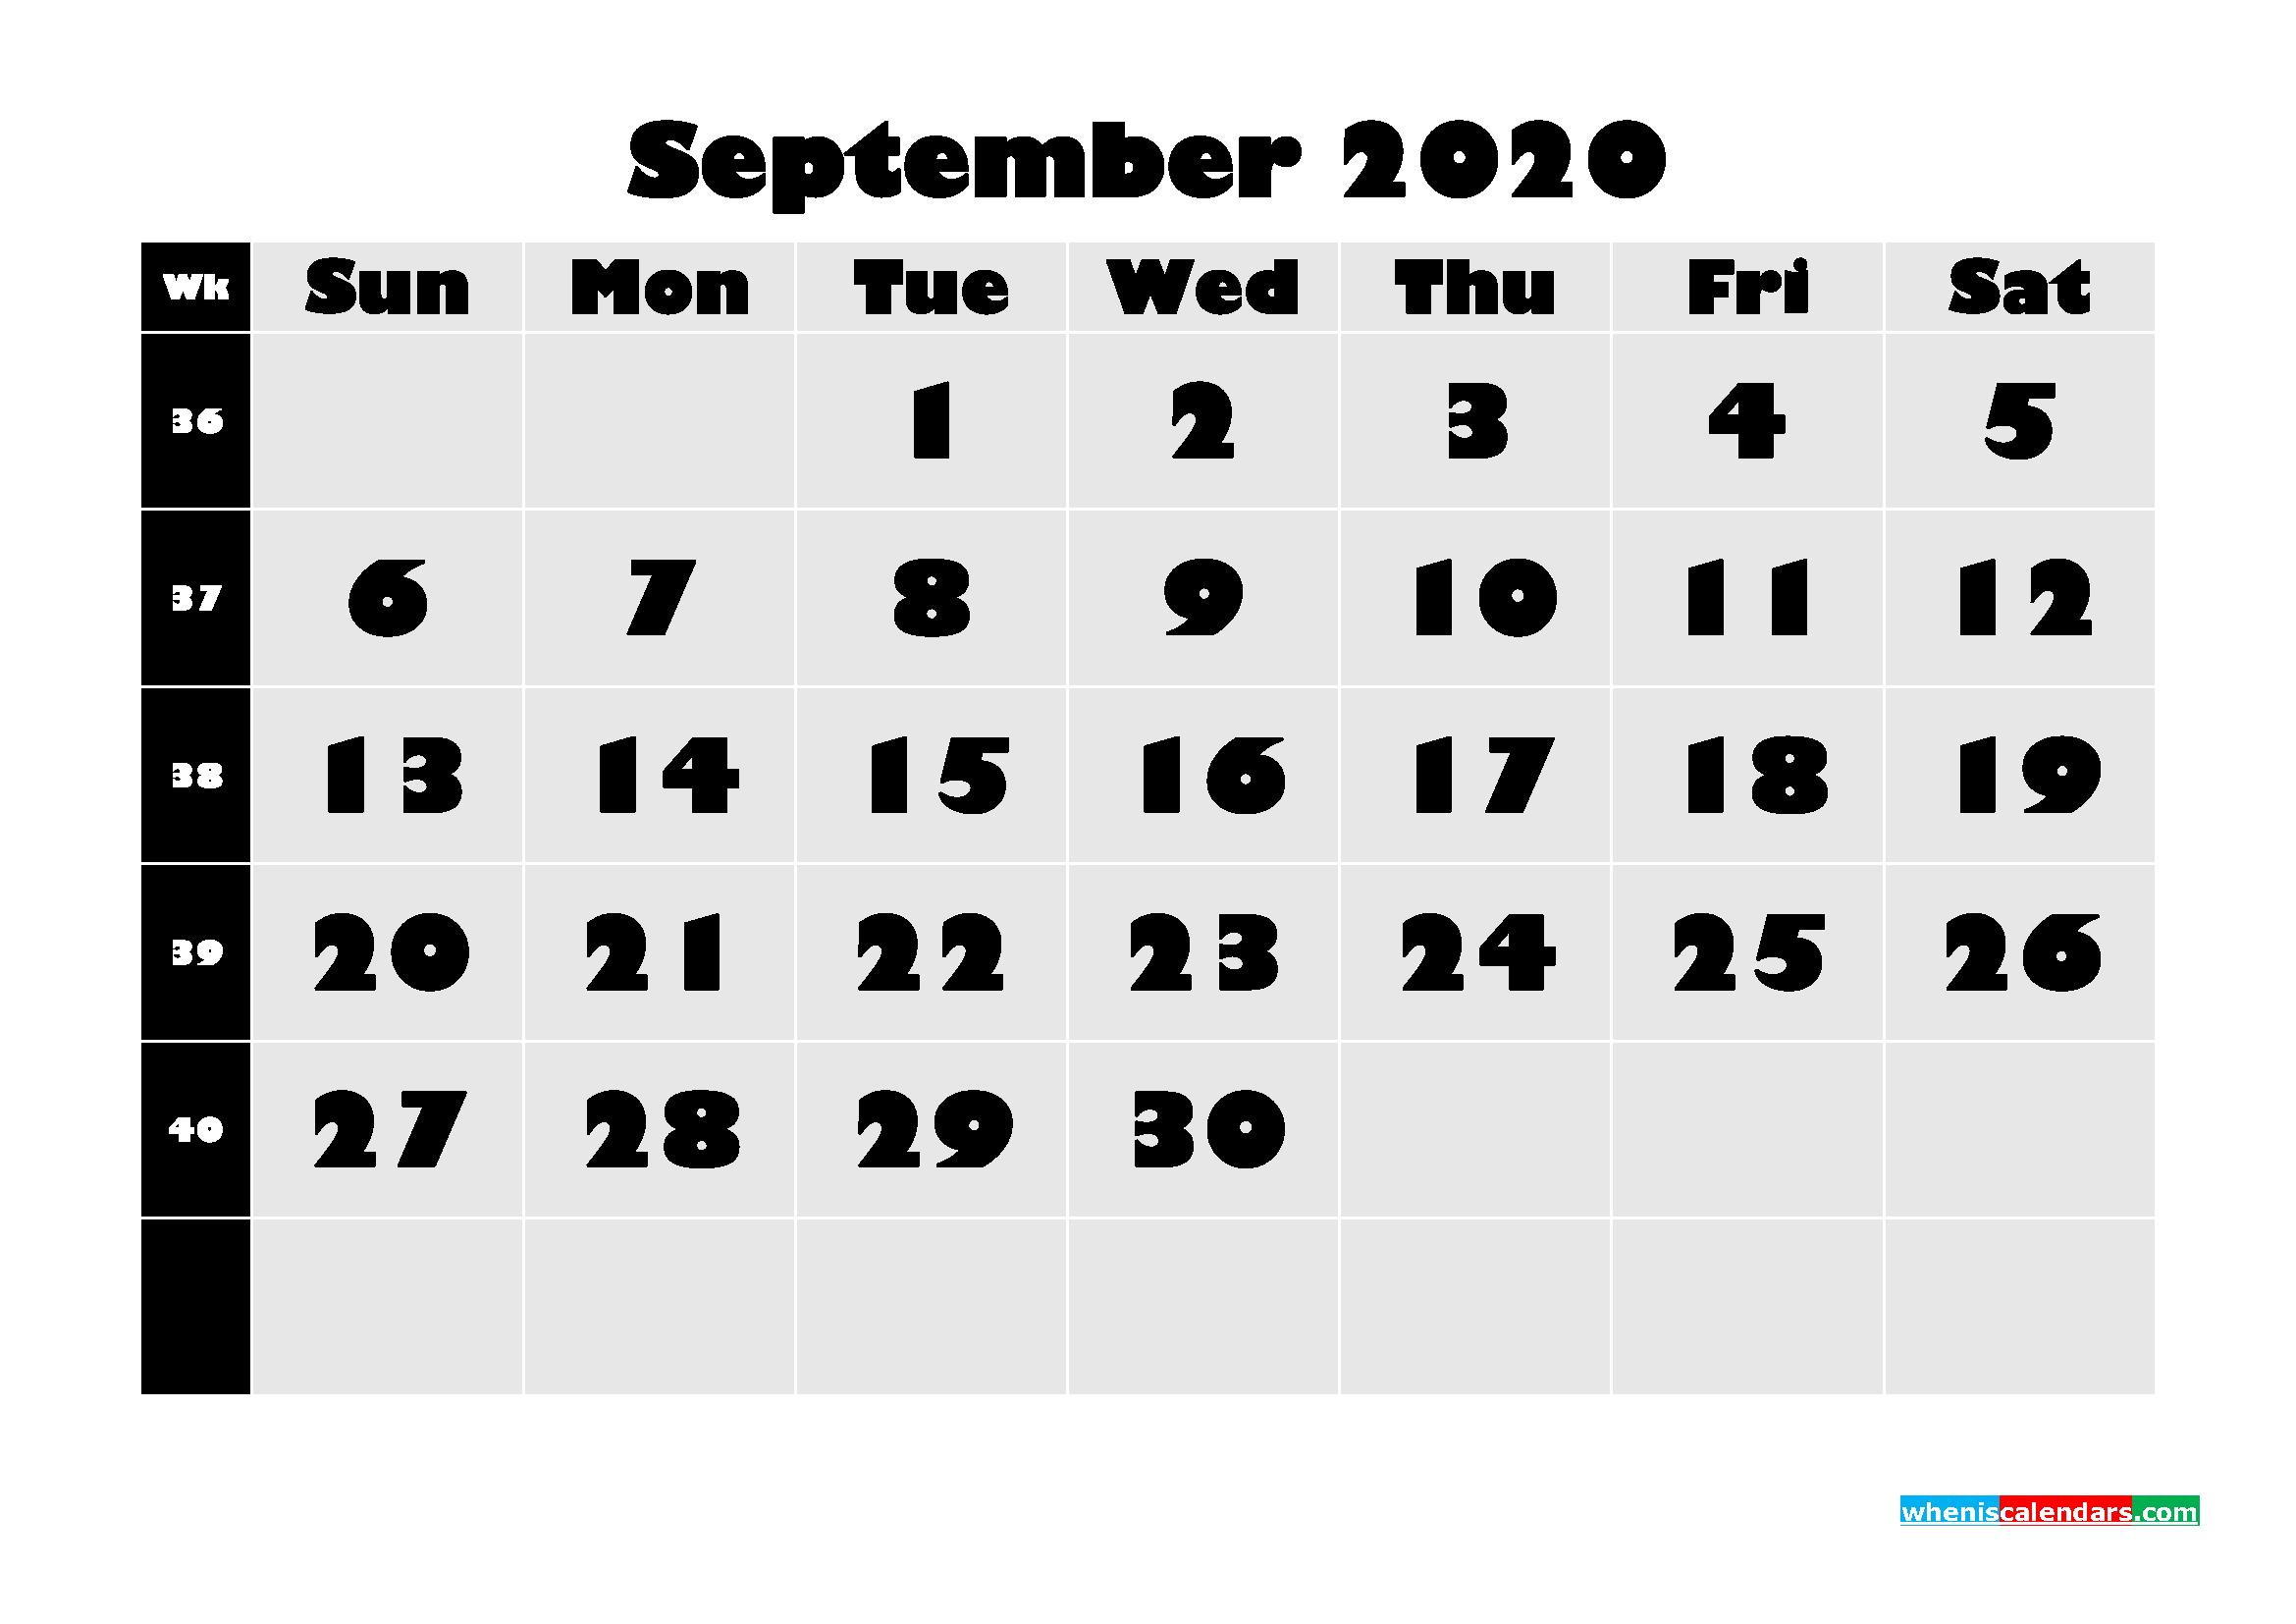 Blank September 2020 Calendar Printable - No.m20b633